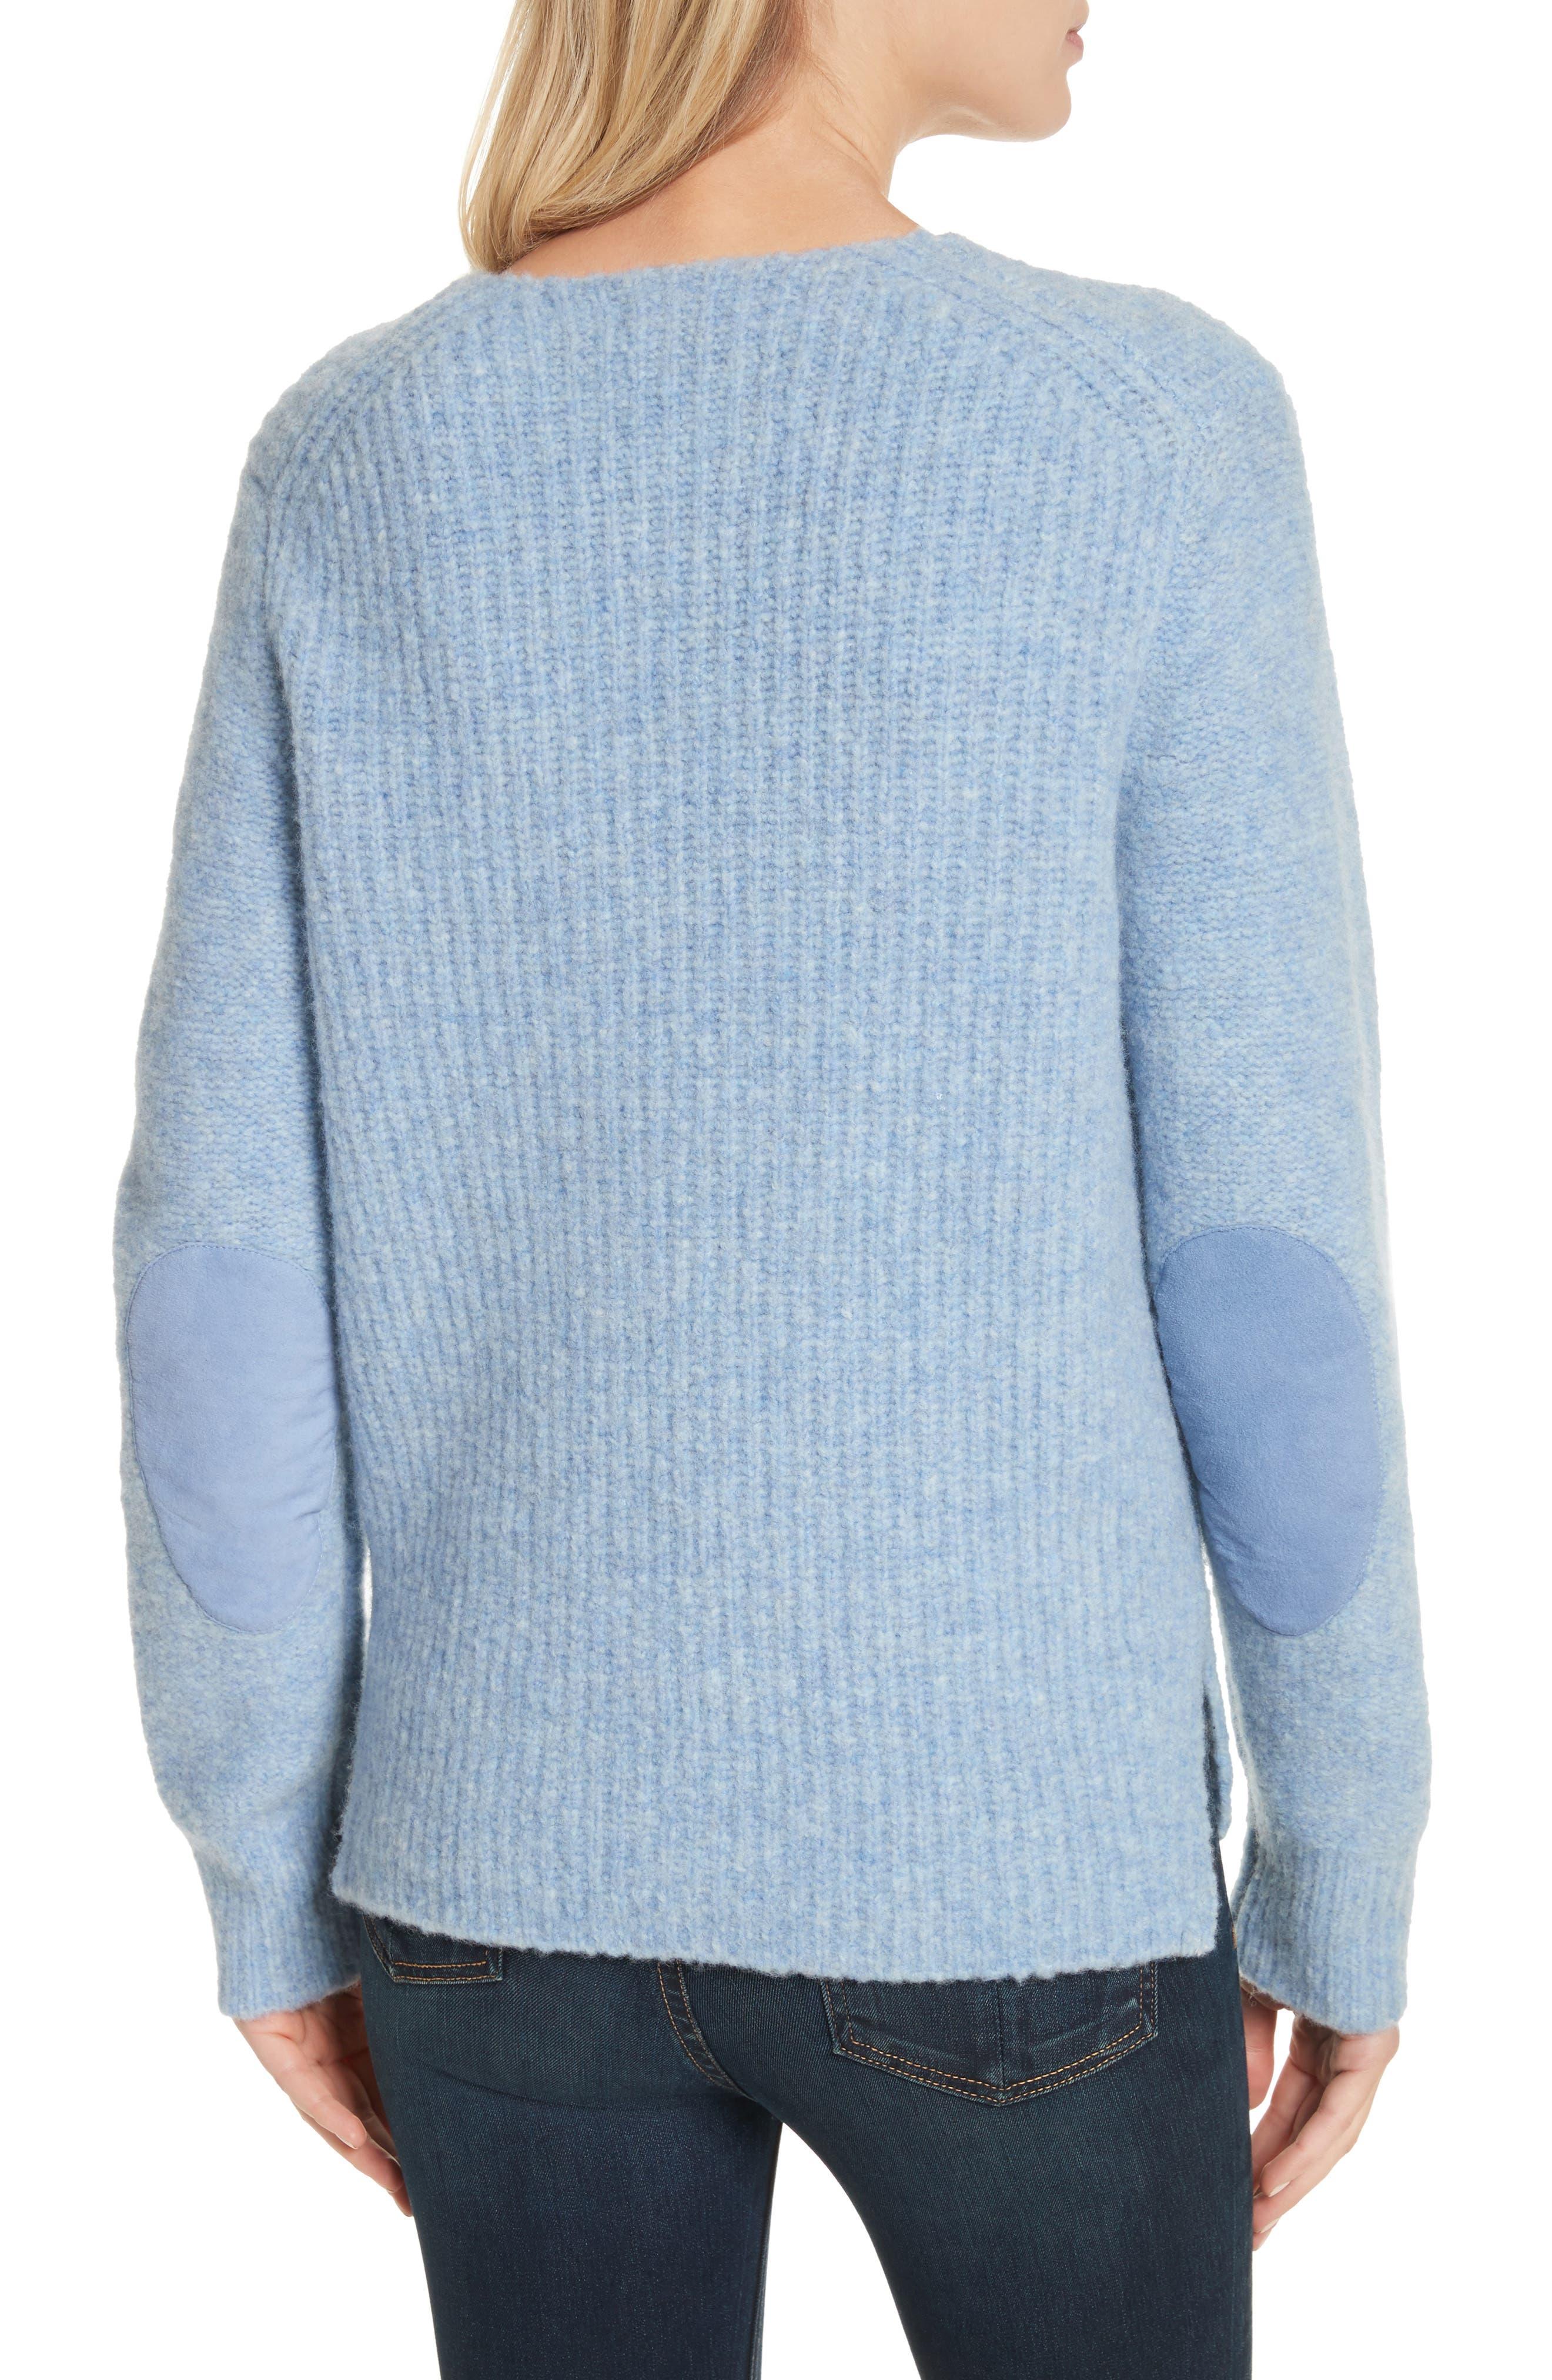 Francie Merino Wool Blend Sweater,                             Alternate thumbnail 2, color,                             Light Blue